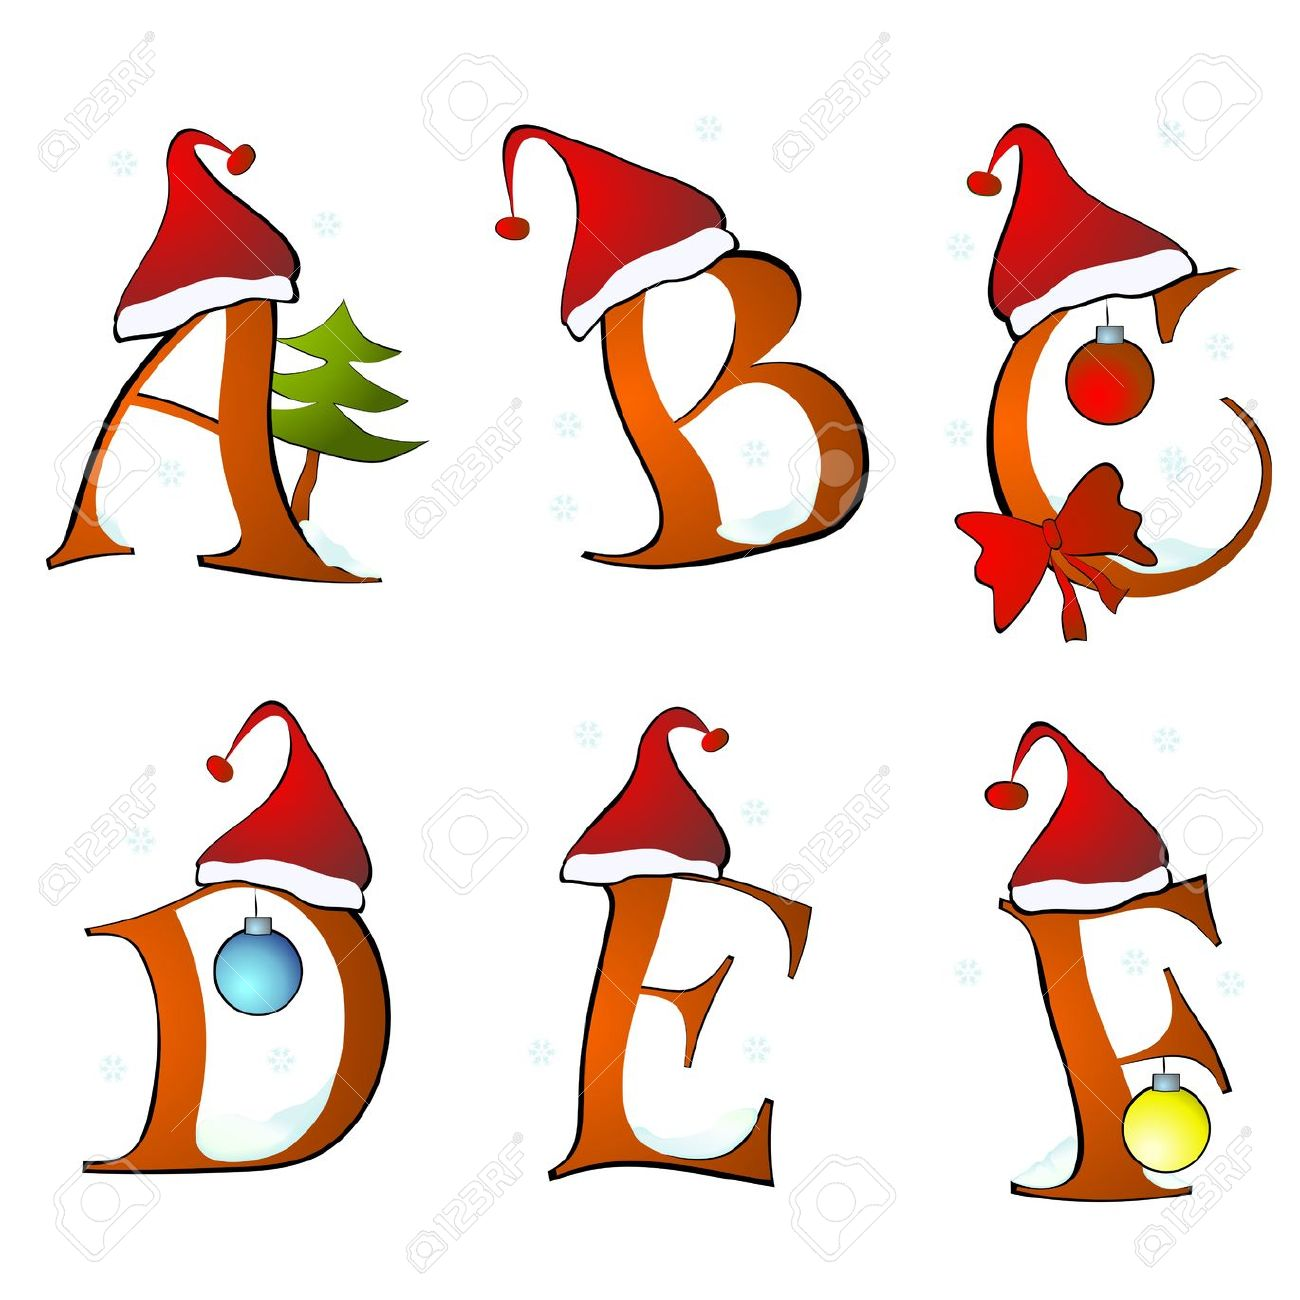 Christmas alphabet clipart vector royalty free download Free fancy christmas alphabet clipart - ClipartFest vector royalty free download